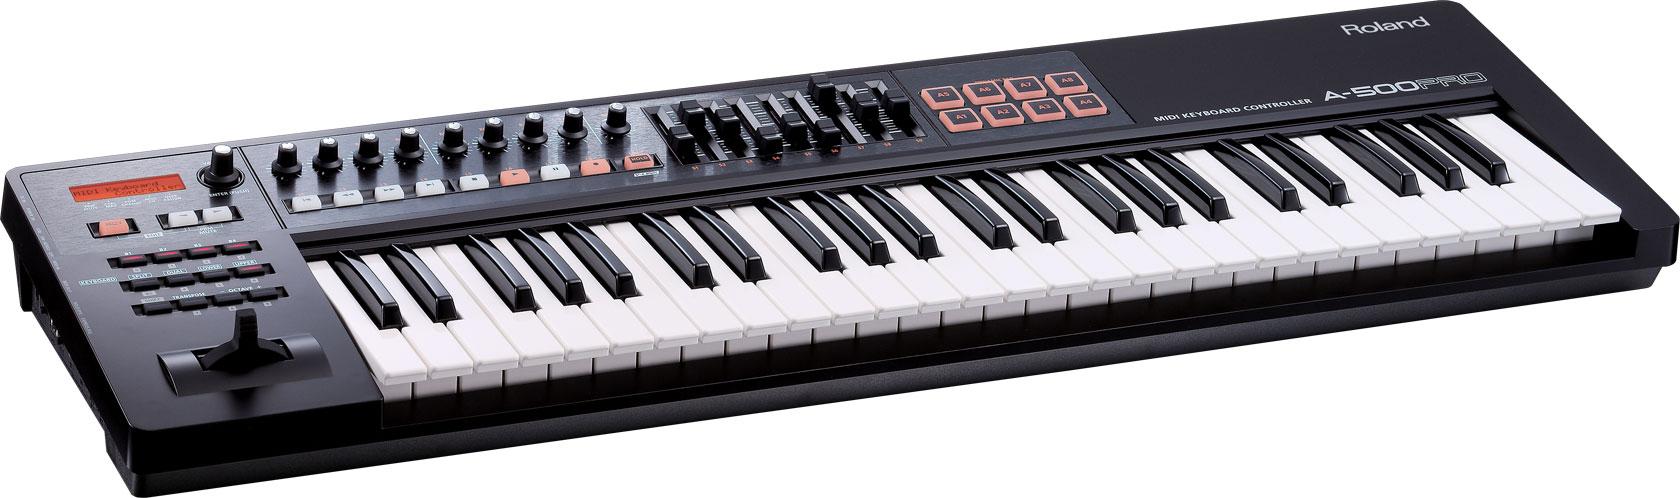 Roland A-500PRO MIDI Keyboard Controller Sound Driver FREE